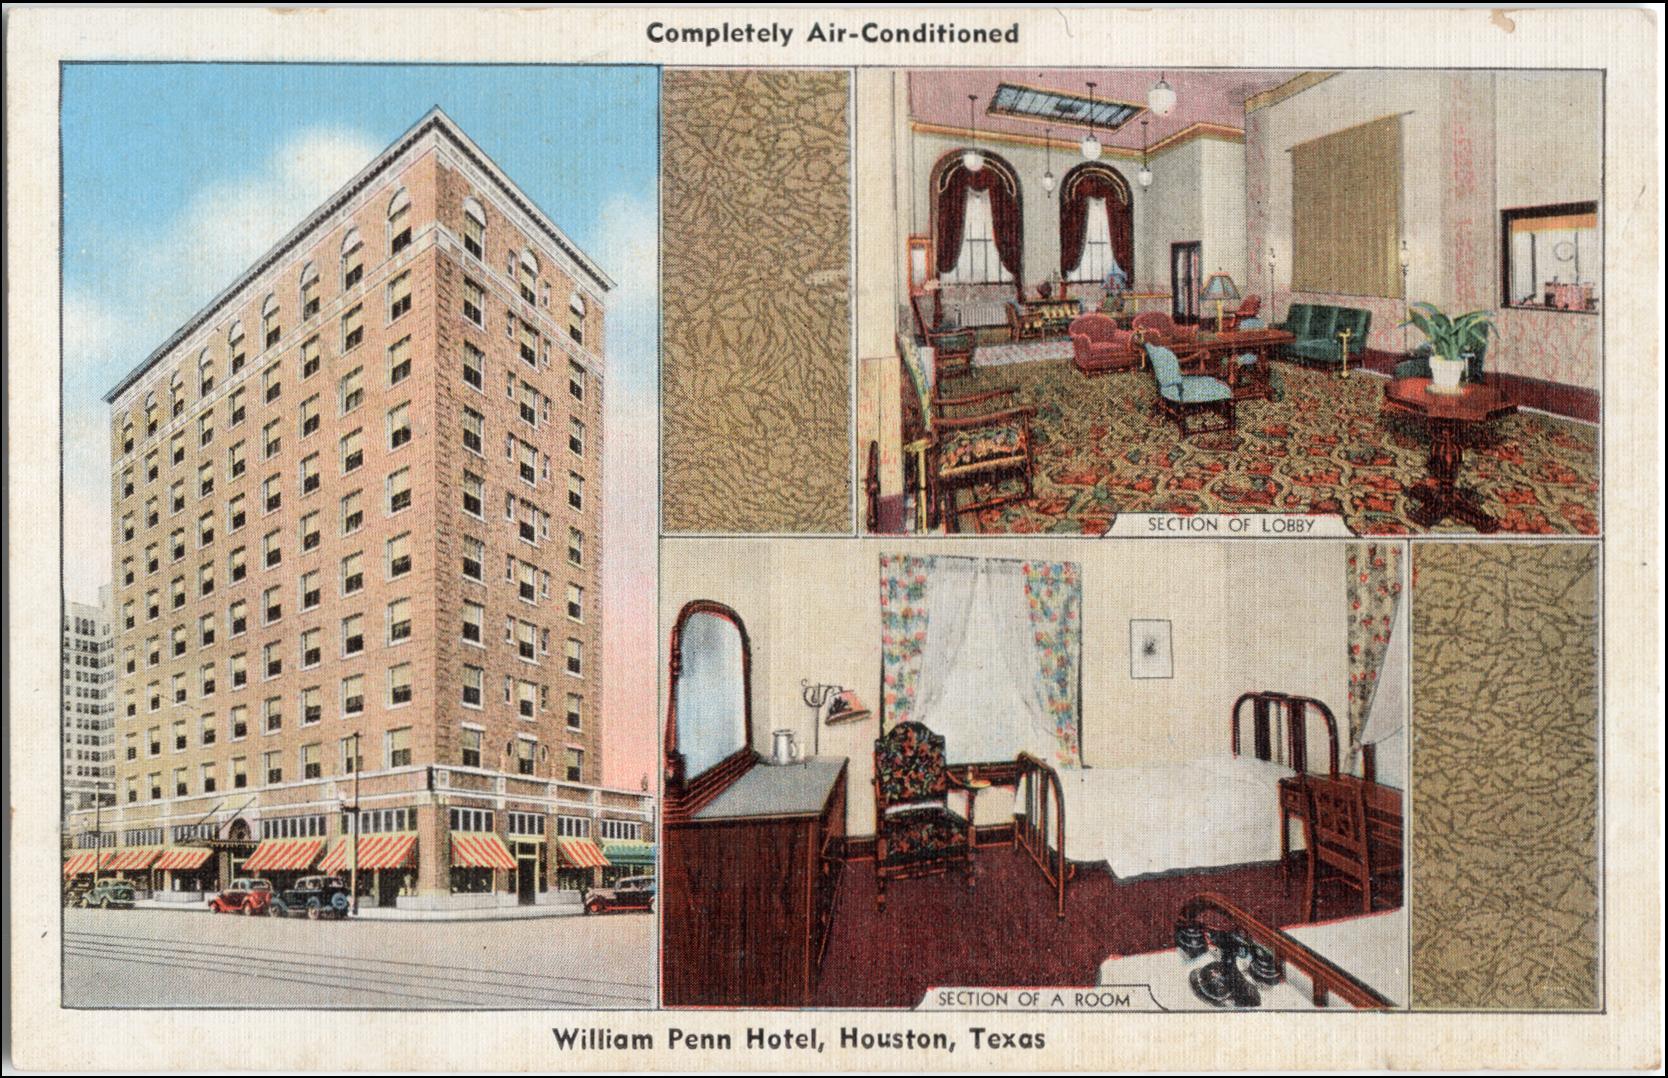 William Penn Hotel, Houston, Texas